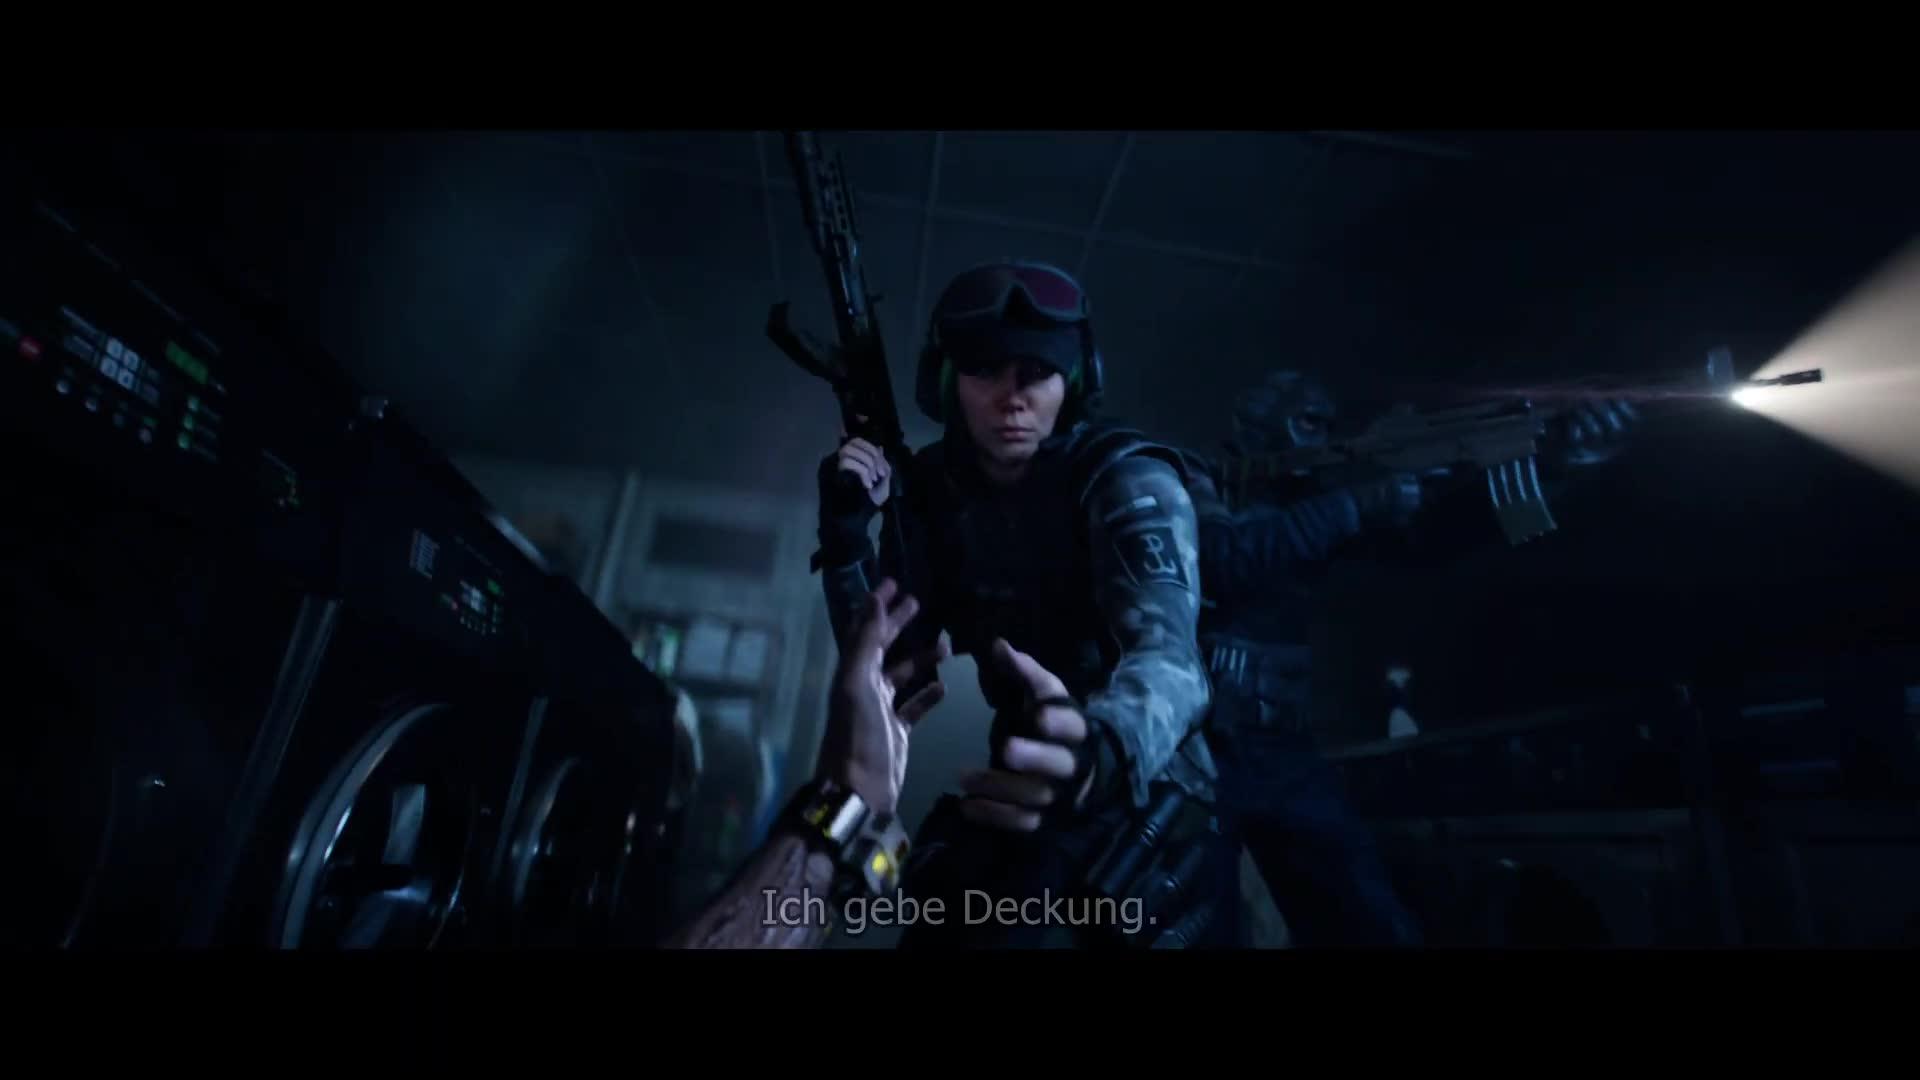 Trailer, Ego-Shooter, Ubisoft, E3, E3 2019, Rainbow Six, Rainbow Six Quarantine